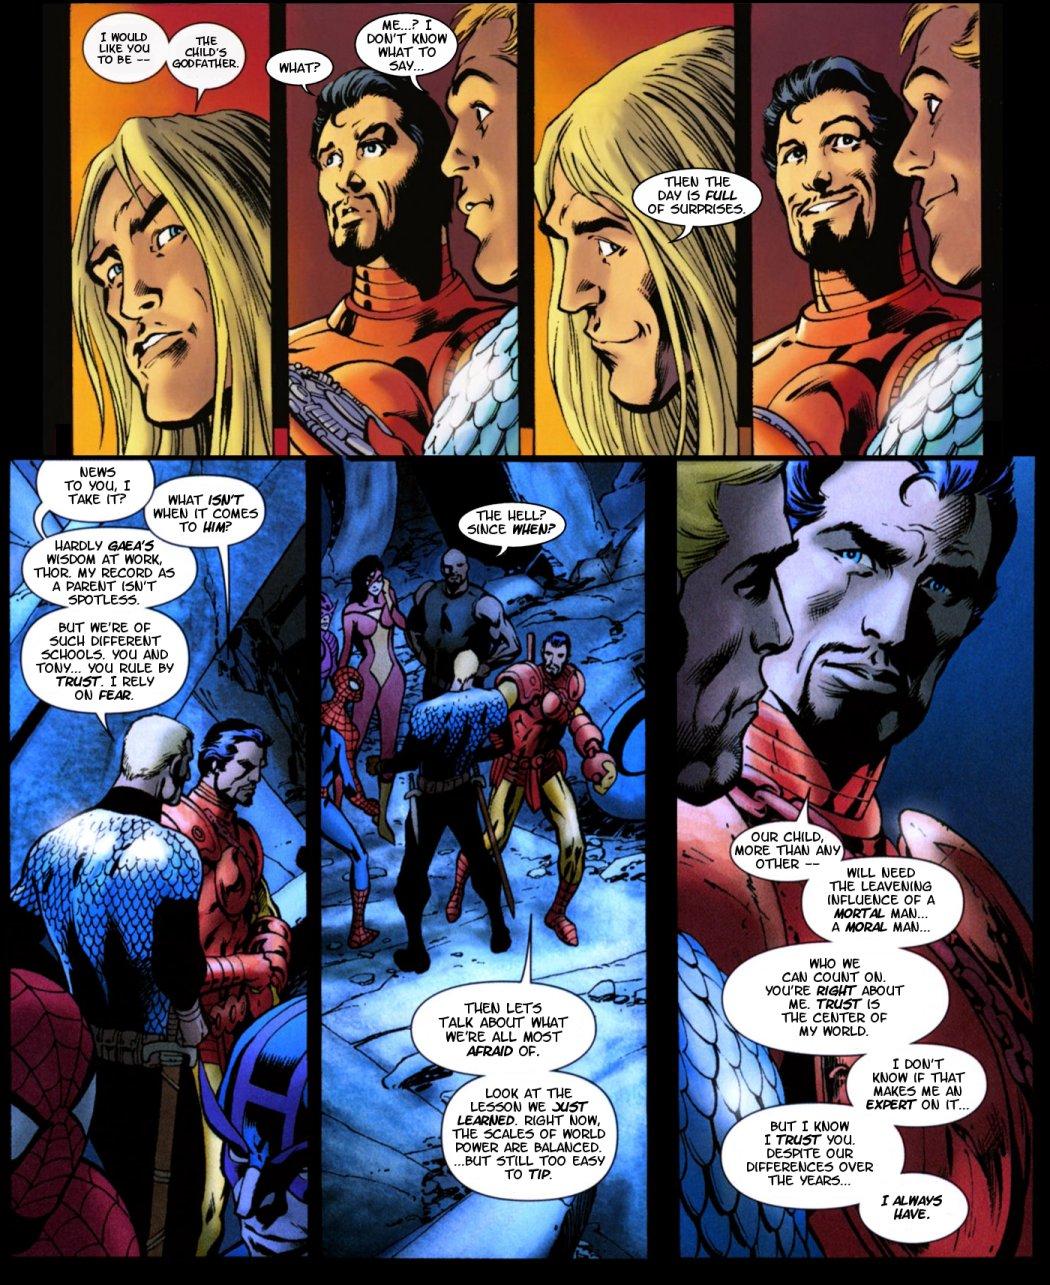 Damian Wayne And Nightstar But still  the ending rang